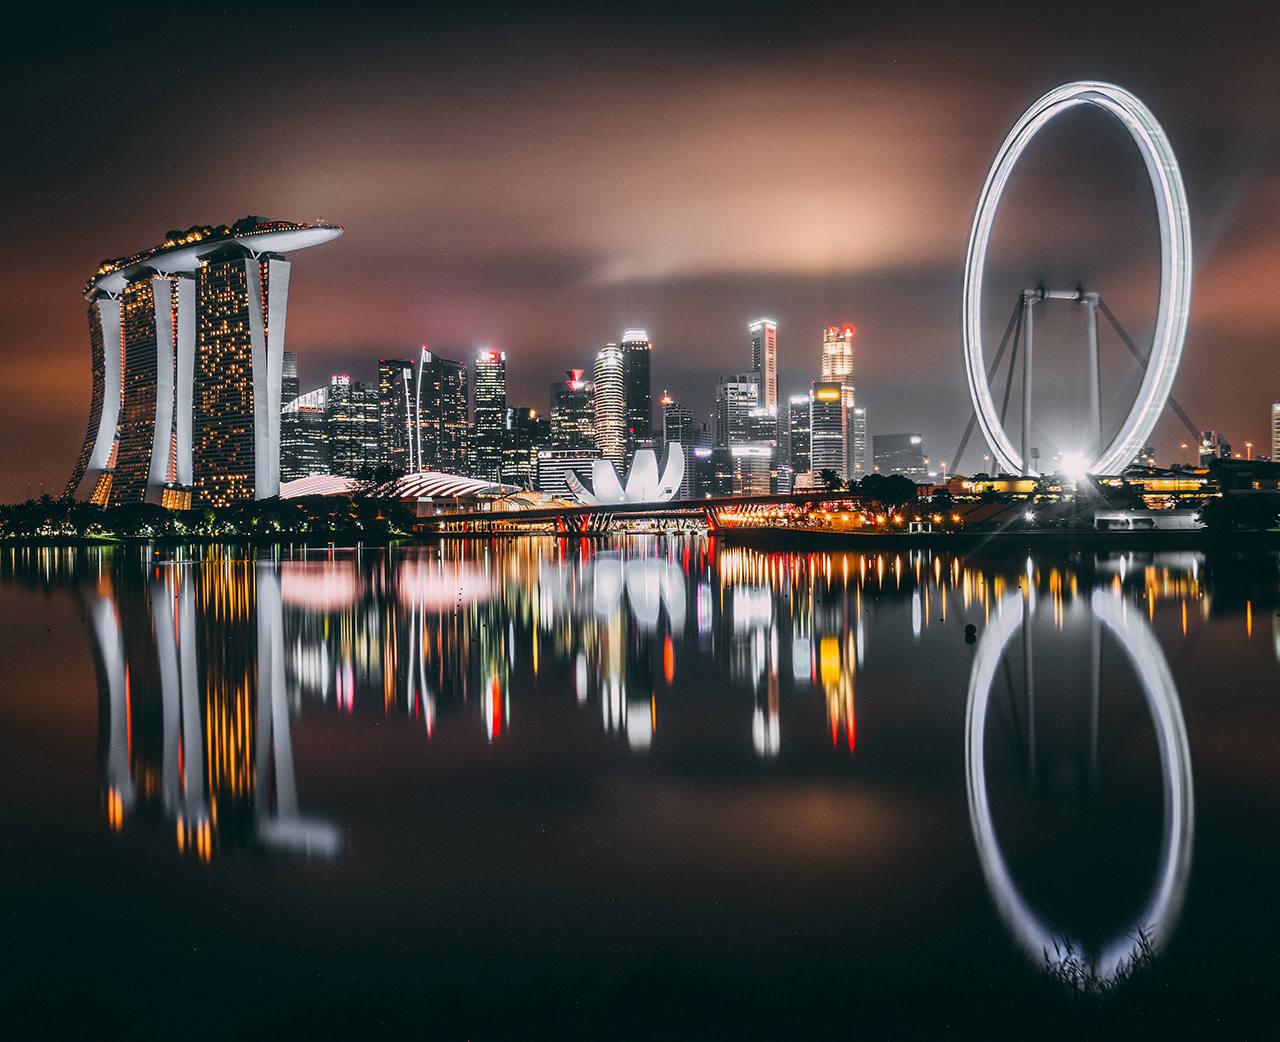 Отдых в Сингапуре по системе всё включено